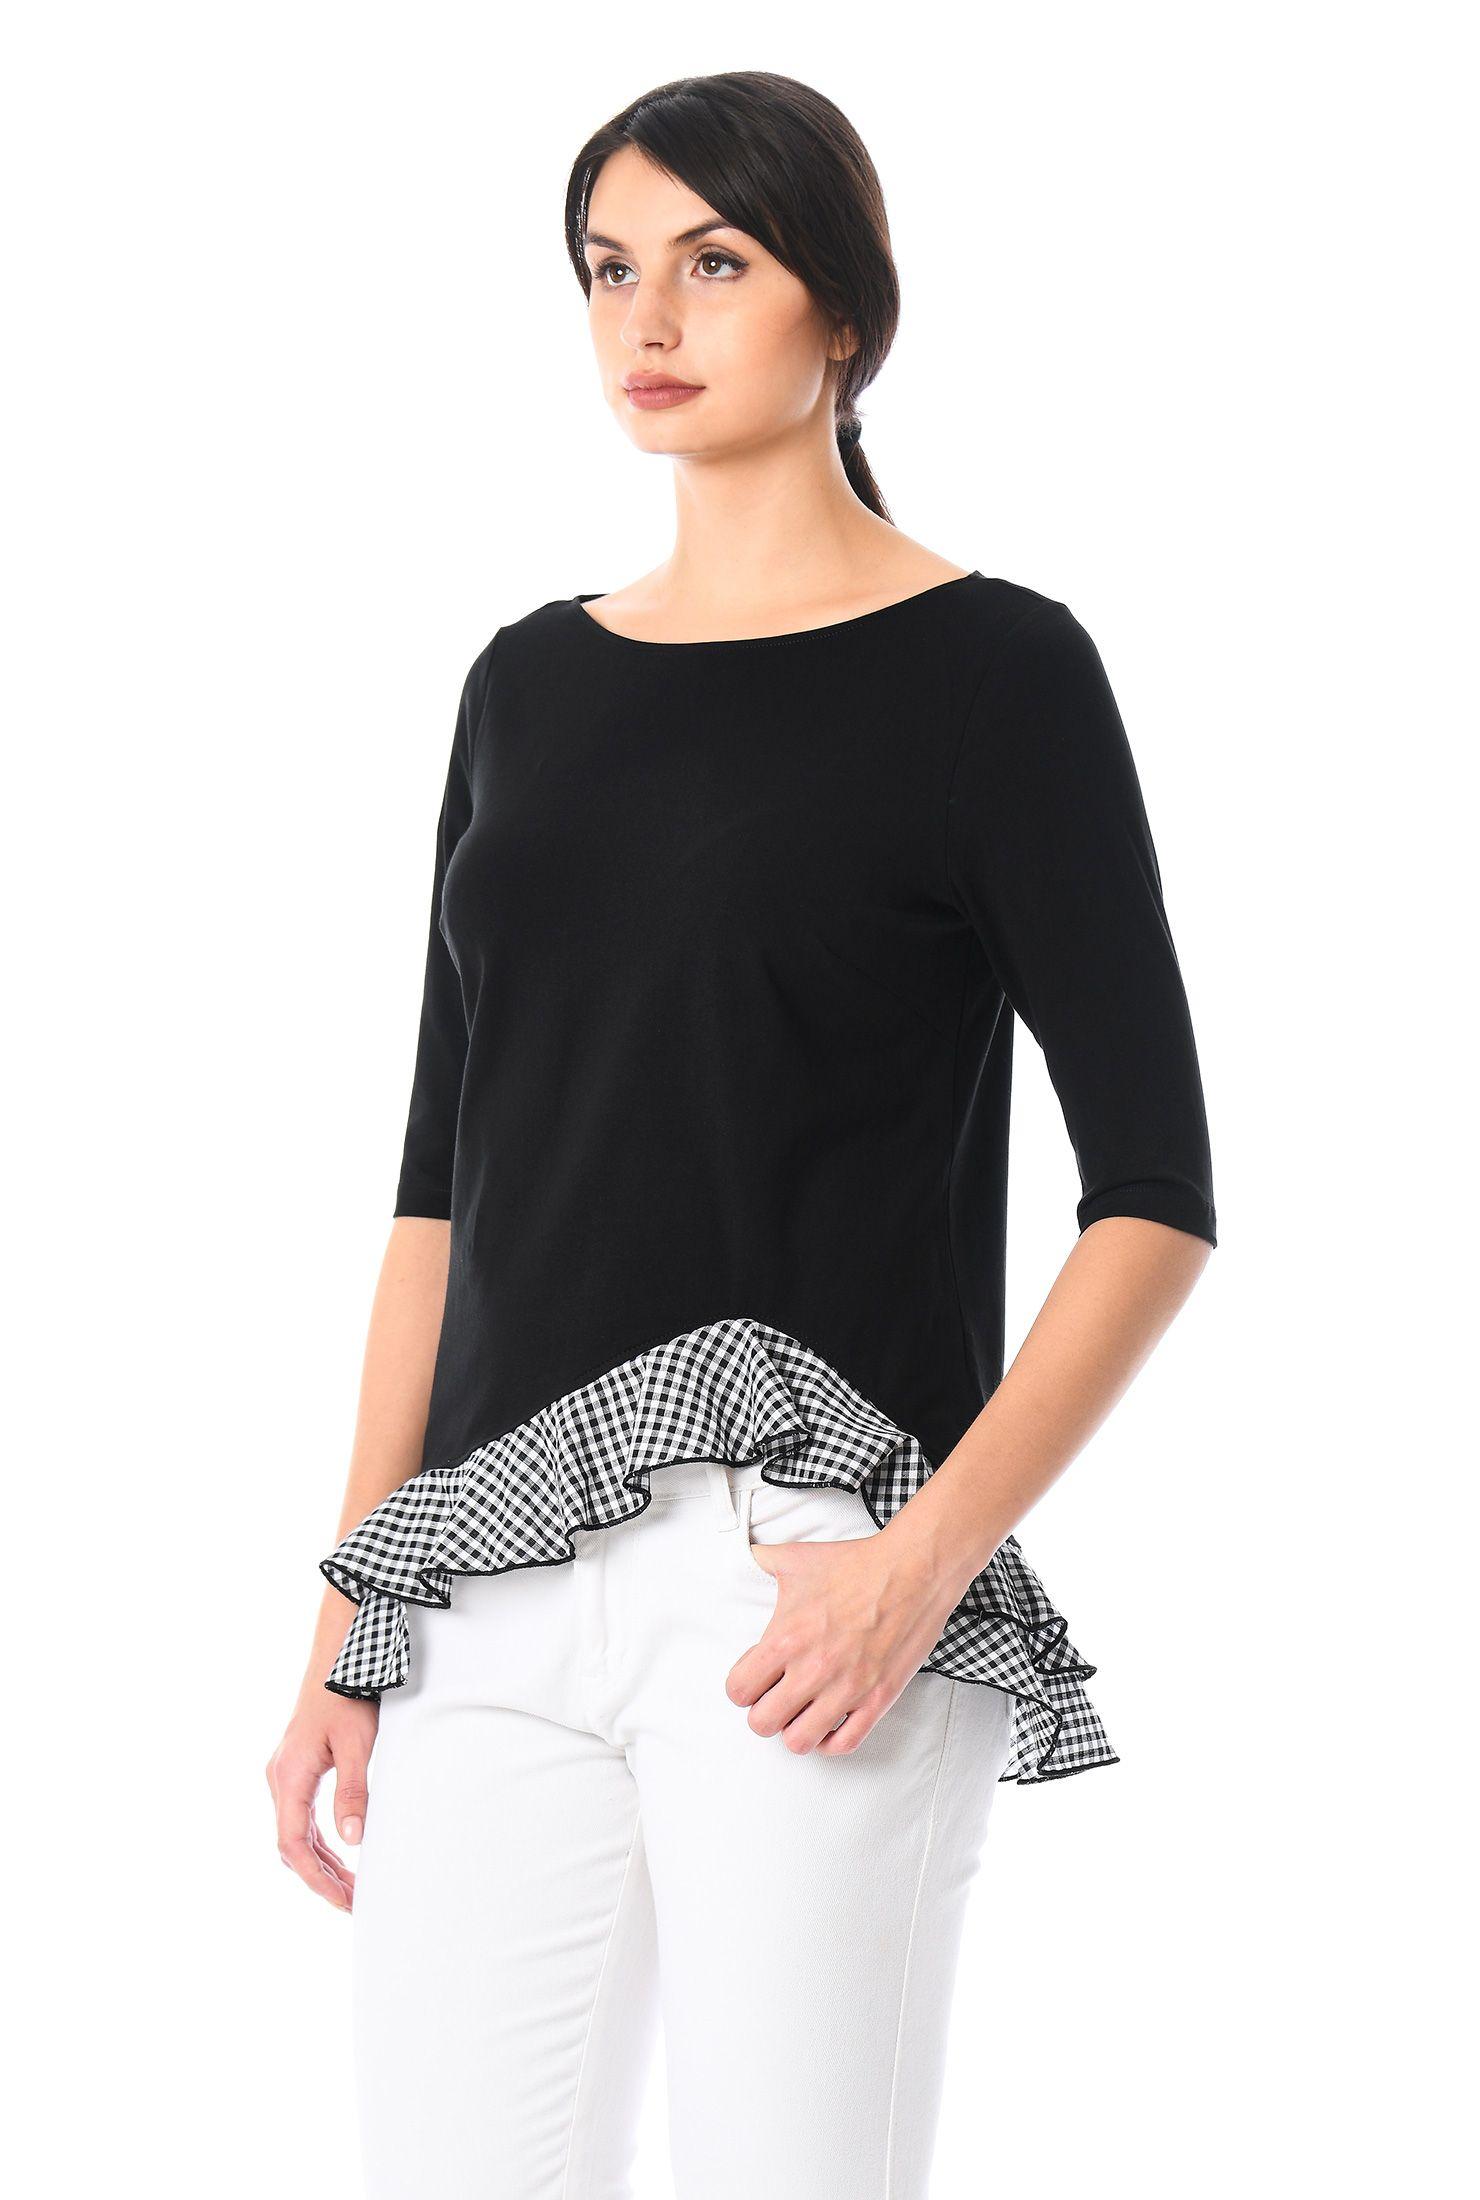 d7853f73a Women's fashion tops, blouses, evening tops, silk blouse, lace tops, cotton